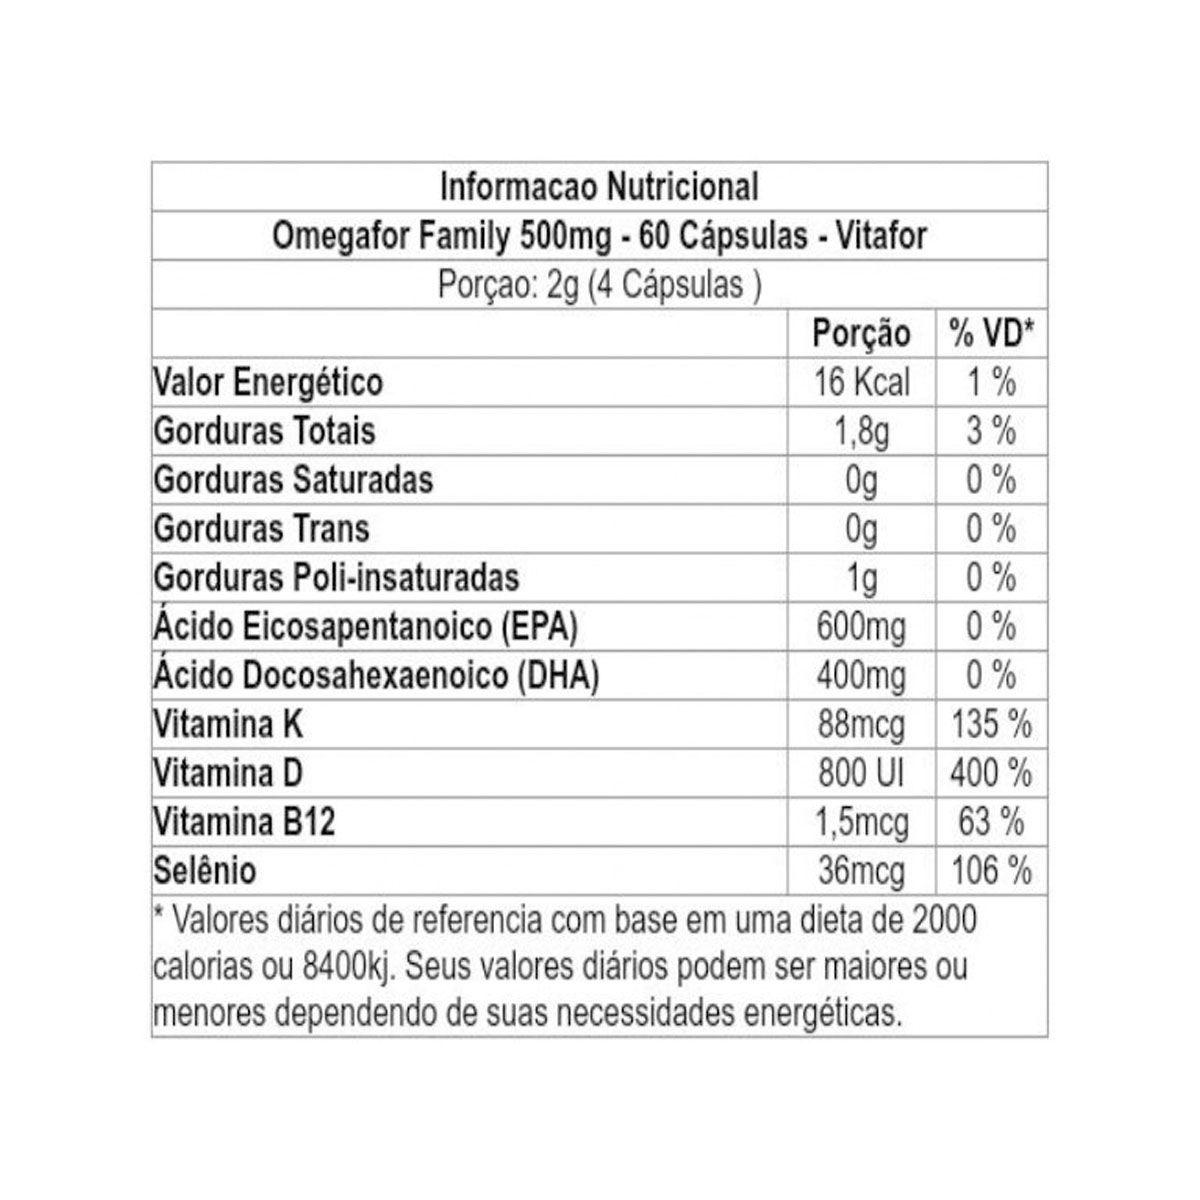 Omegafor Family 60 cápsulas 500mg - Vitafor